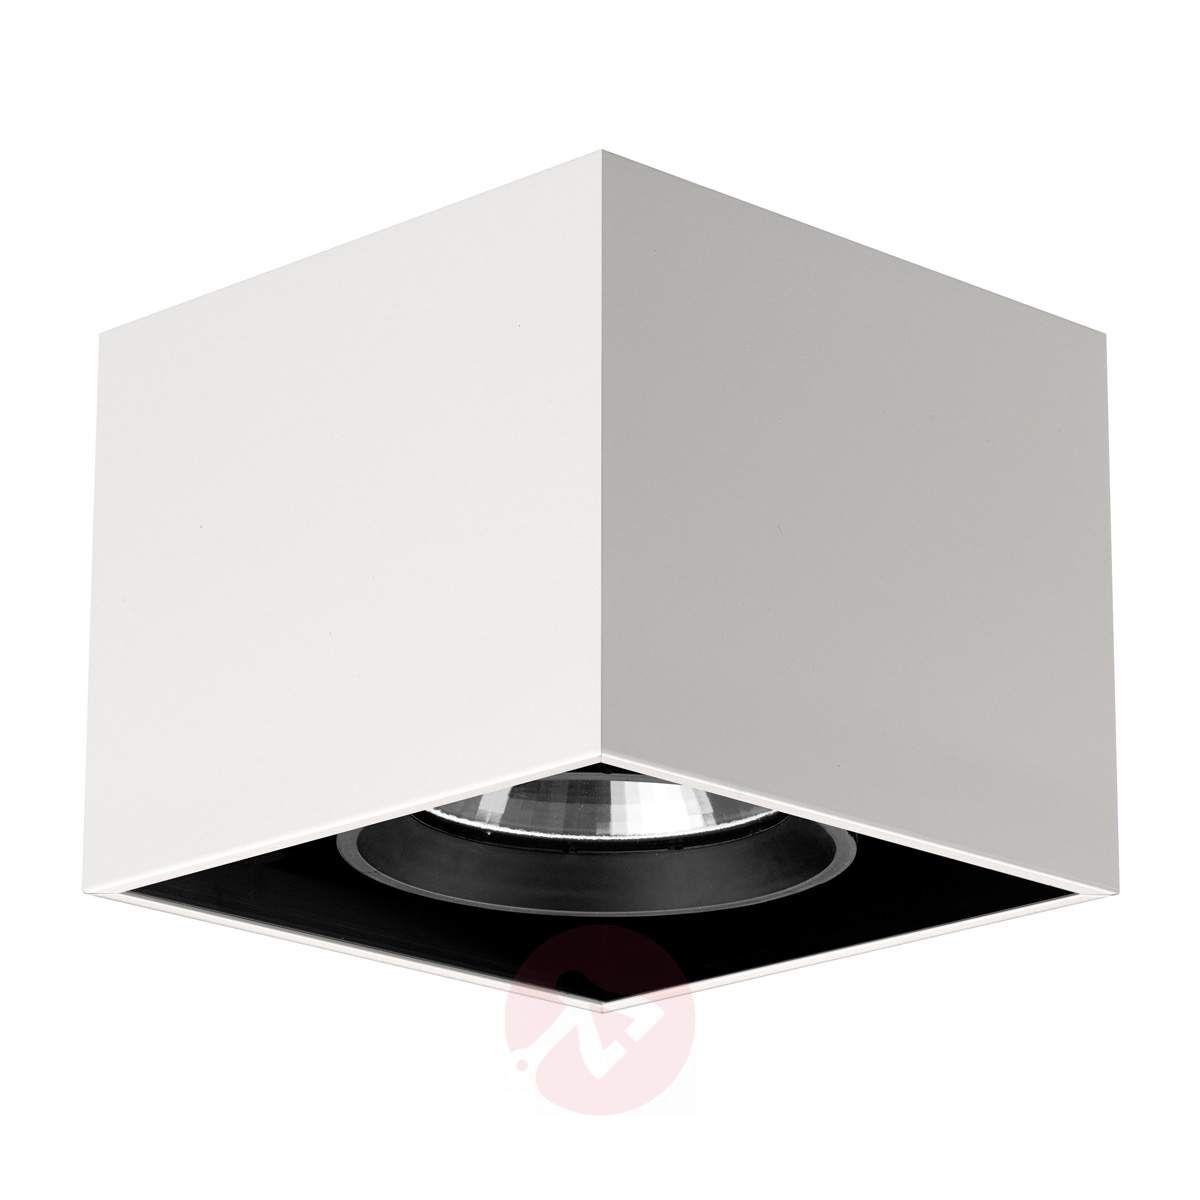 Kwadratowa Lampa Sufitowa Compass Box Biała W 2019 Lampy